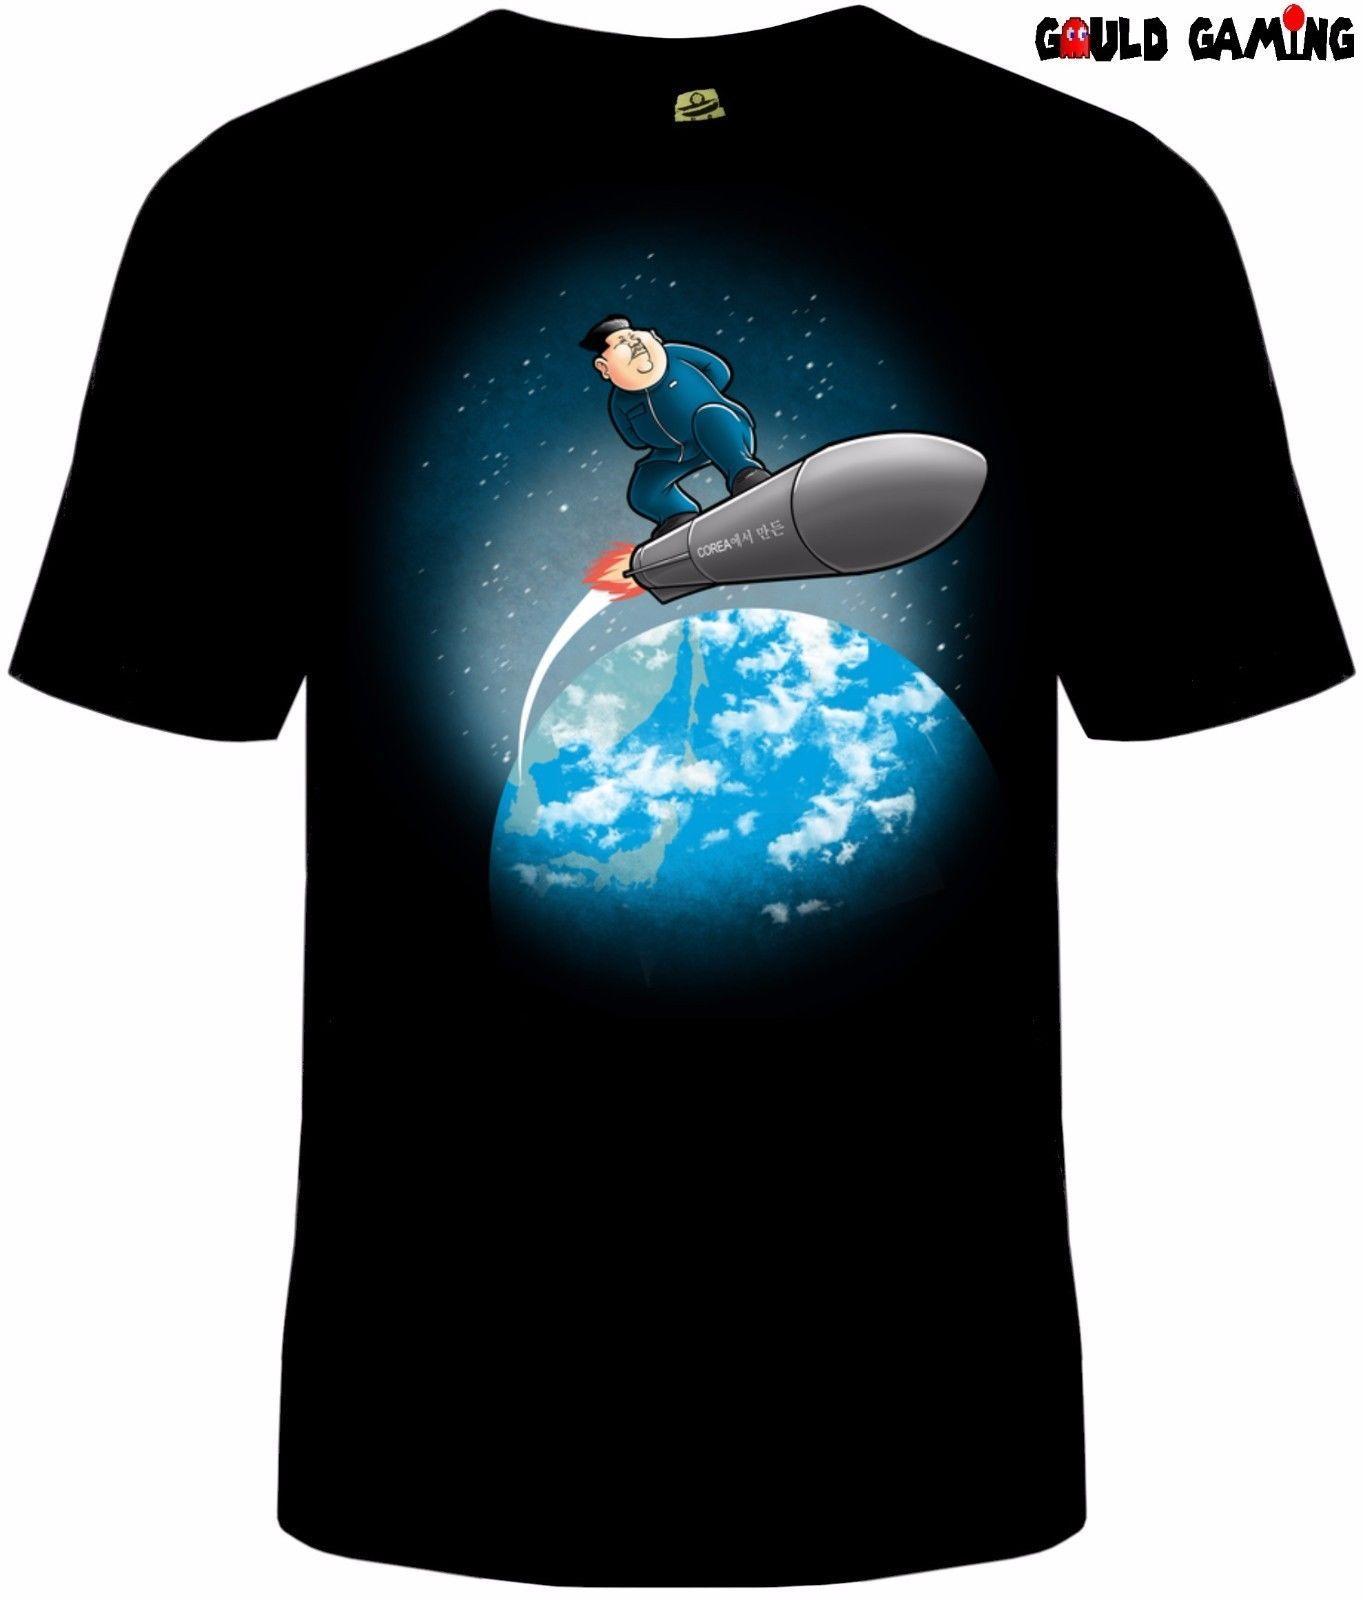 36a61d60 Rocket Man North Korea T Shirt Unisex Adult Funny Pro Trump Political Sizes  New Shopping T Shirts Amusing T Shirts From Notkillape, $11.01| DHgate.Com